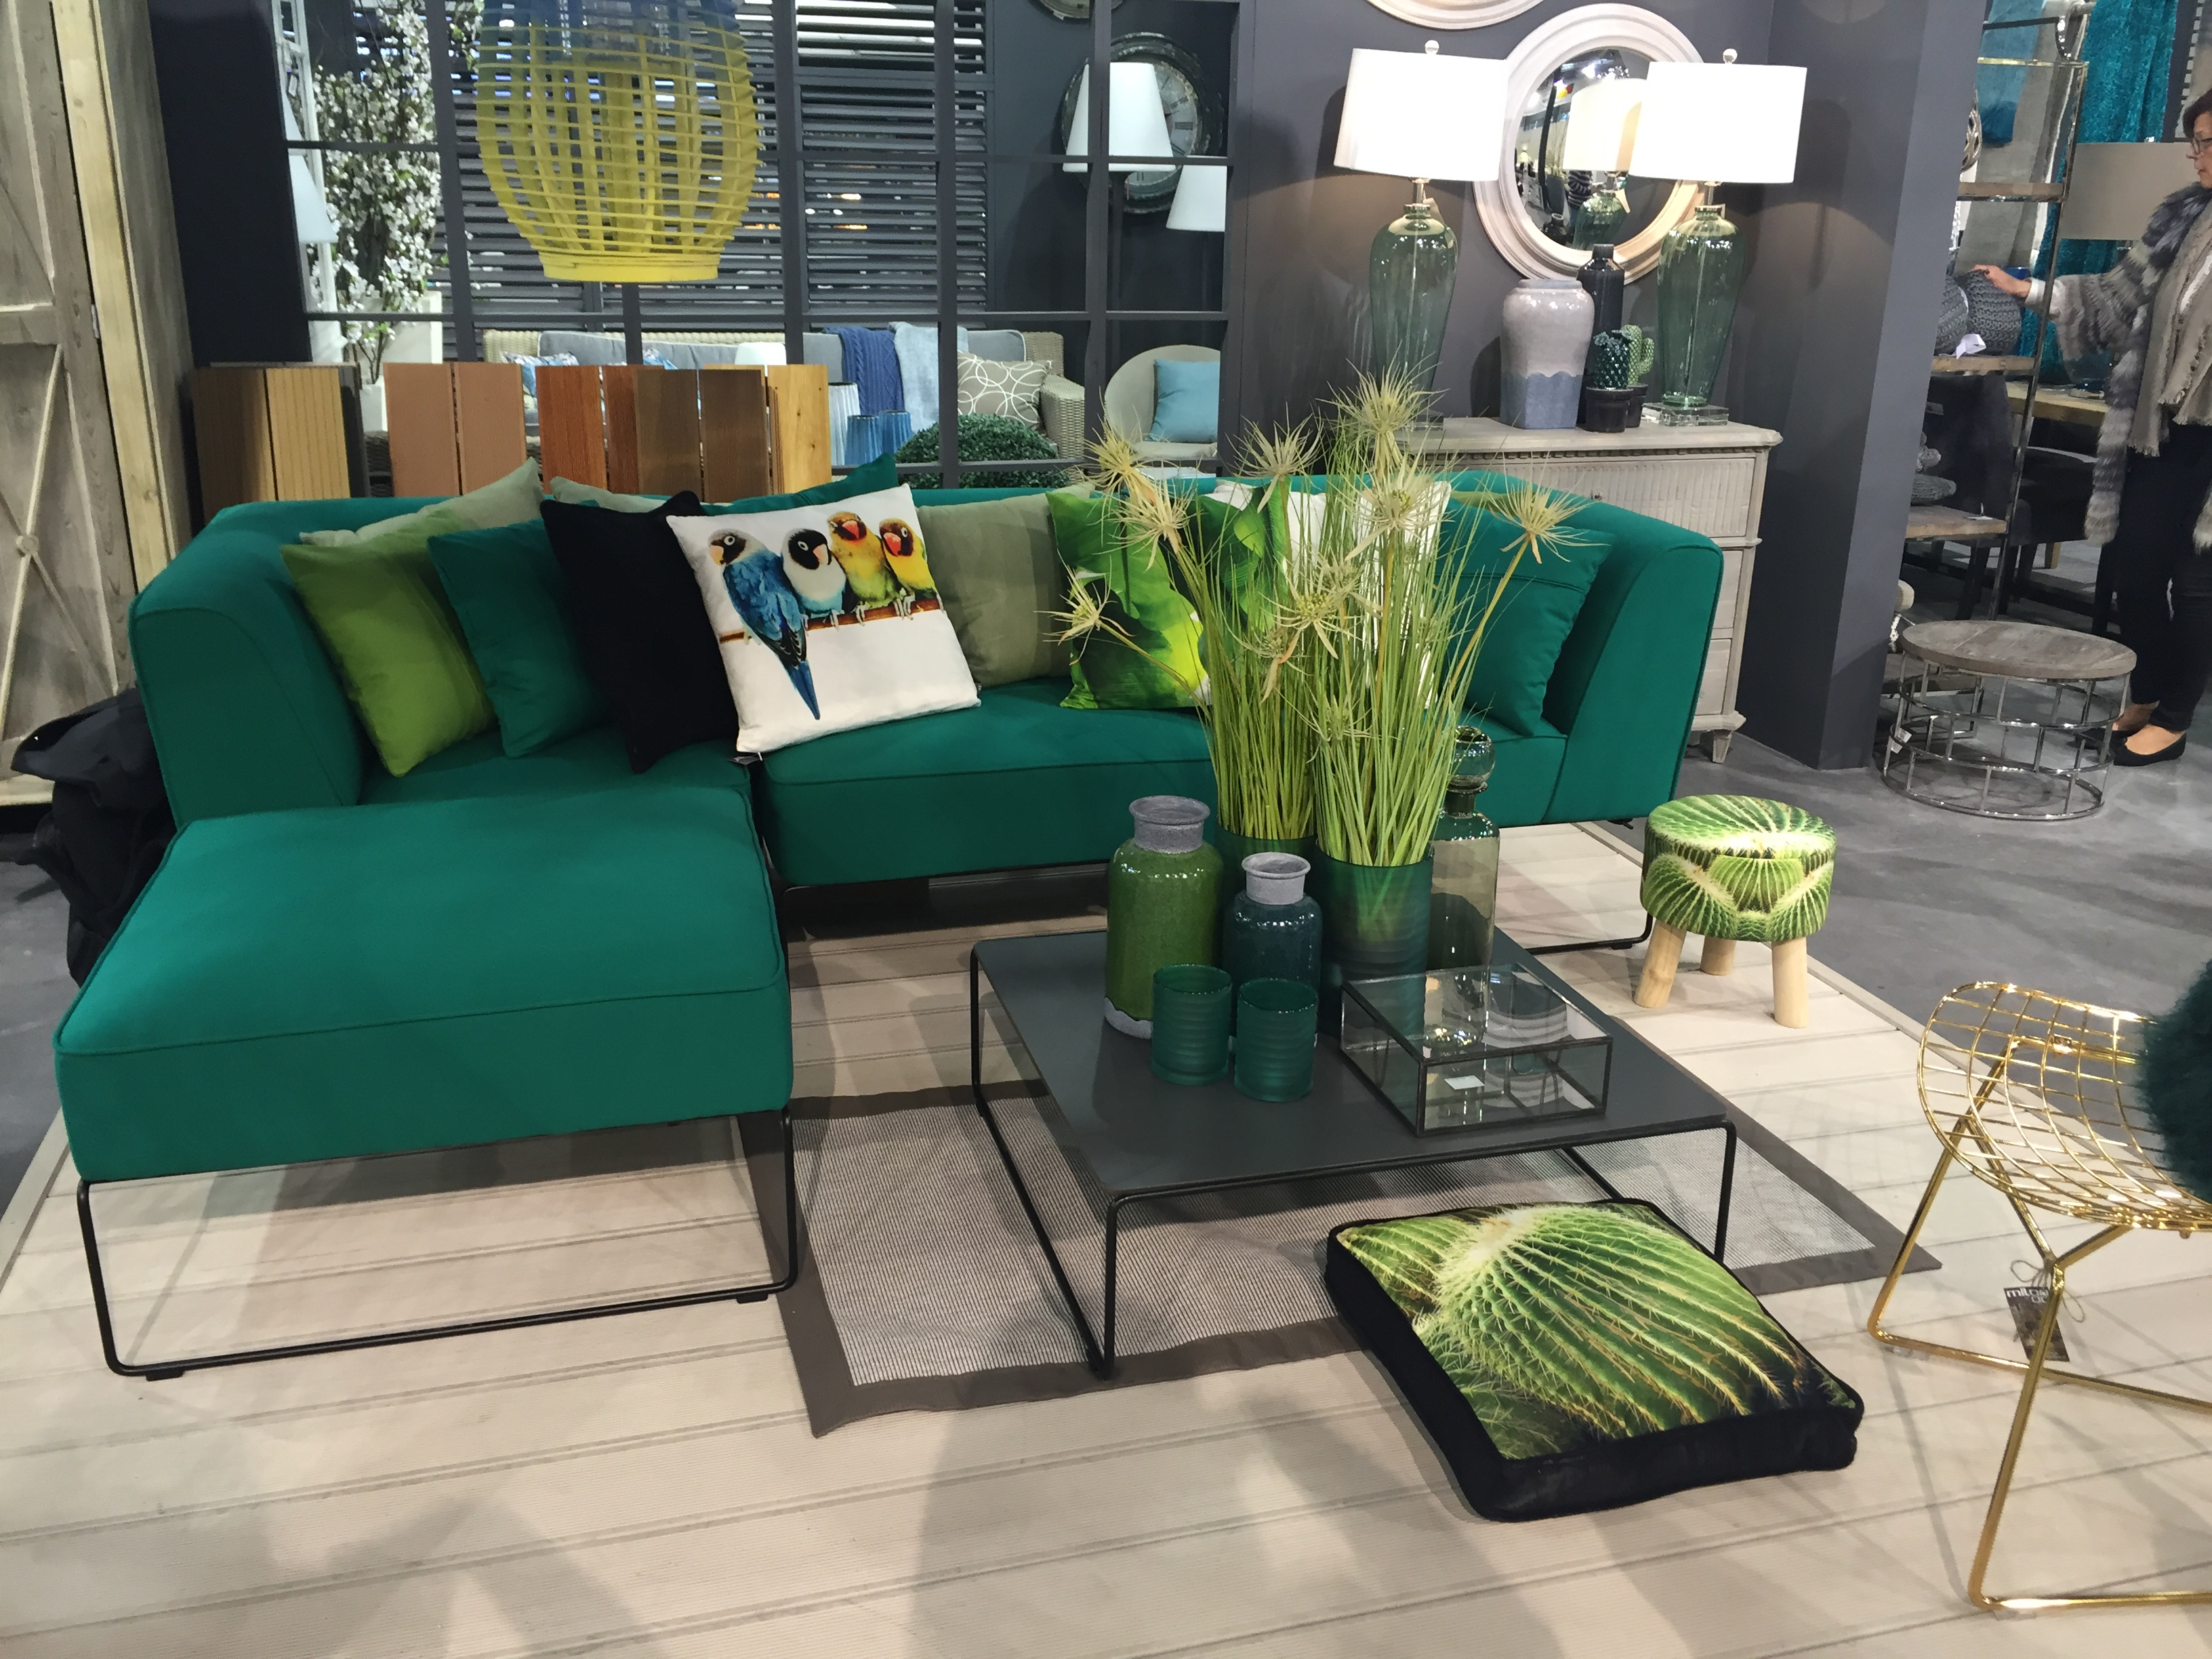 m belmesse posen polen aktuelles m belmesse posen polen emma m bel. Black Bedroom Furniture Sets. Home Design Ideas